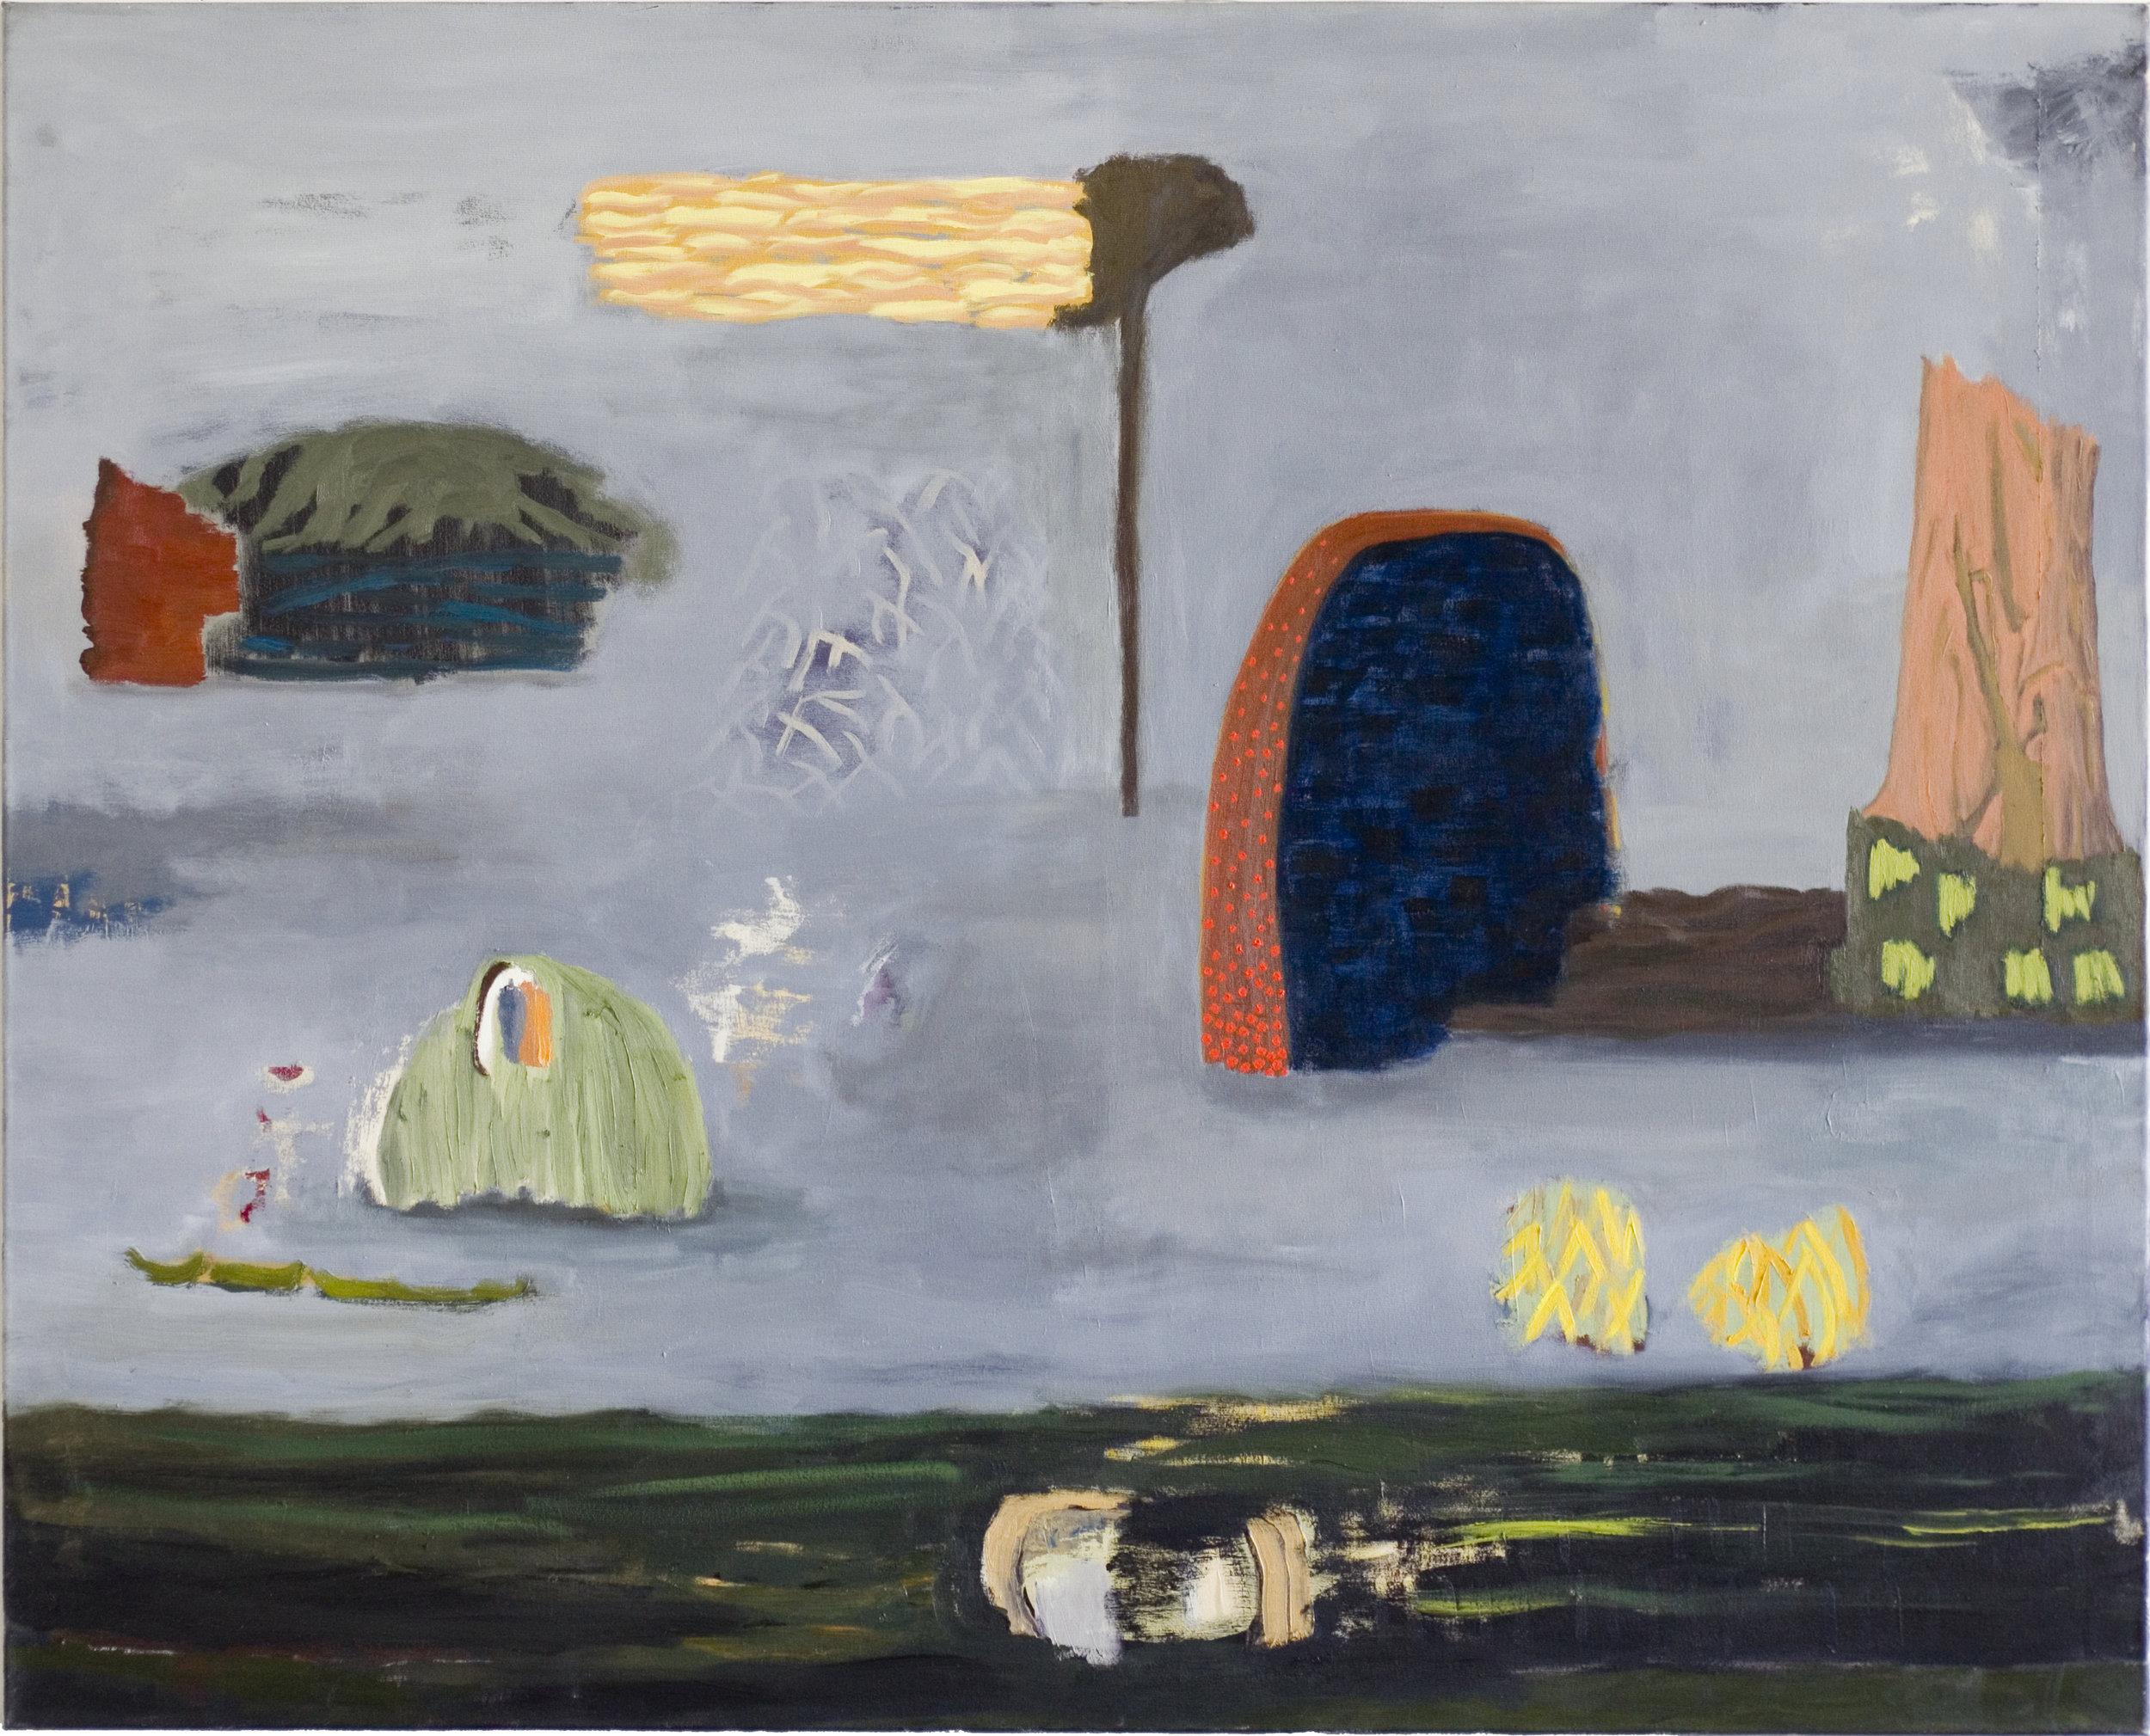 Veronika Hilger, untitled, 2012, oil on canvas, 130 x 150 cm